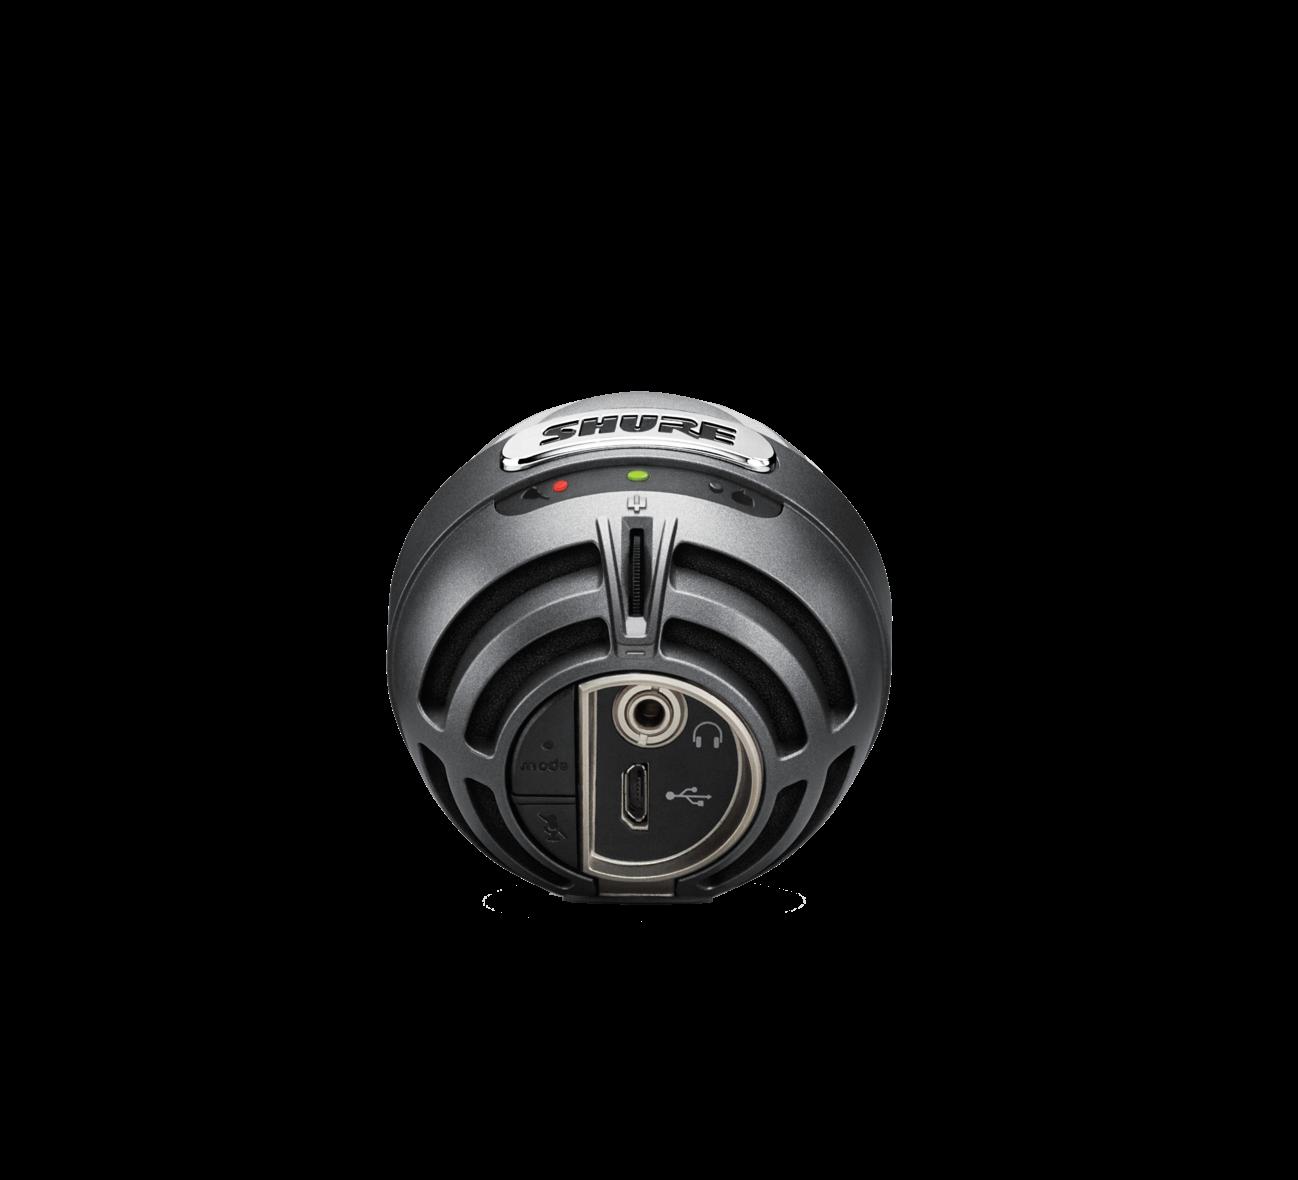 SHURE MV5-DIG CONDENSER MICROPHONE GREY USB & LIGHTNING CCAB